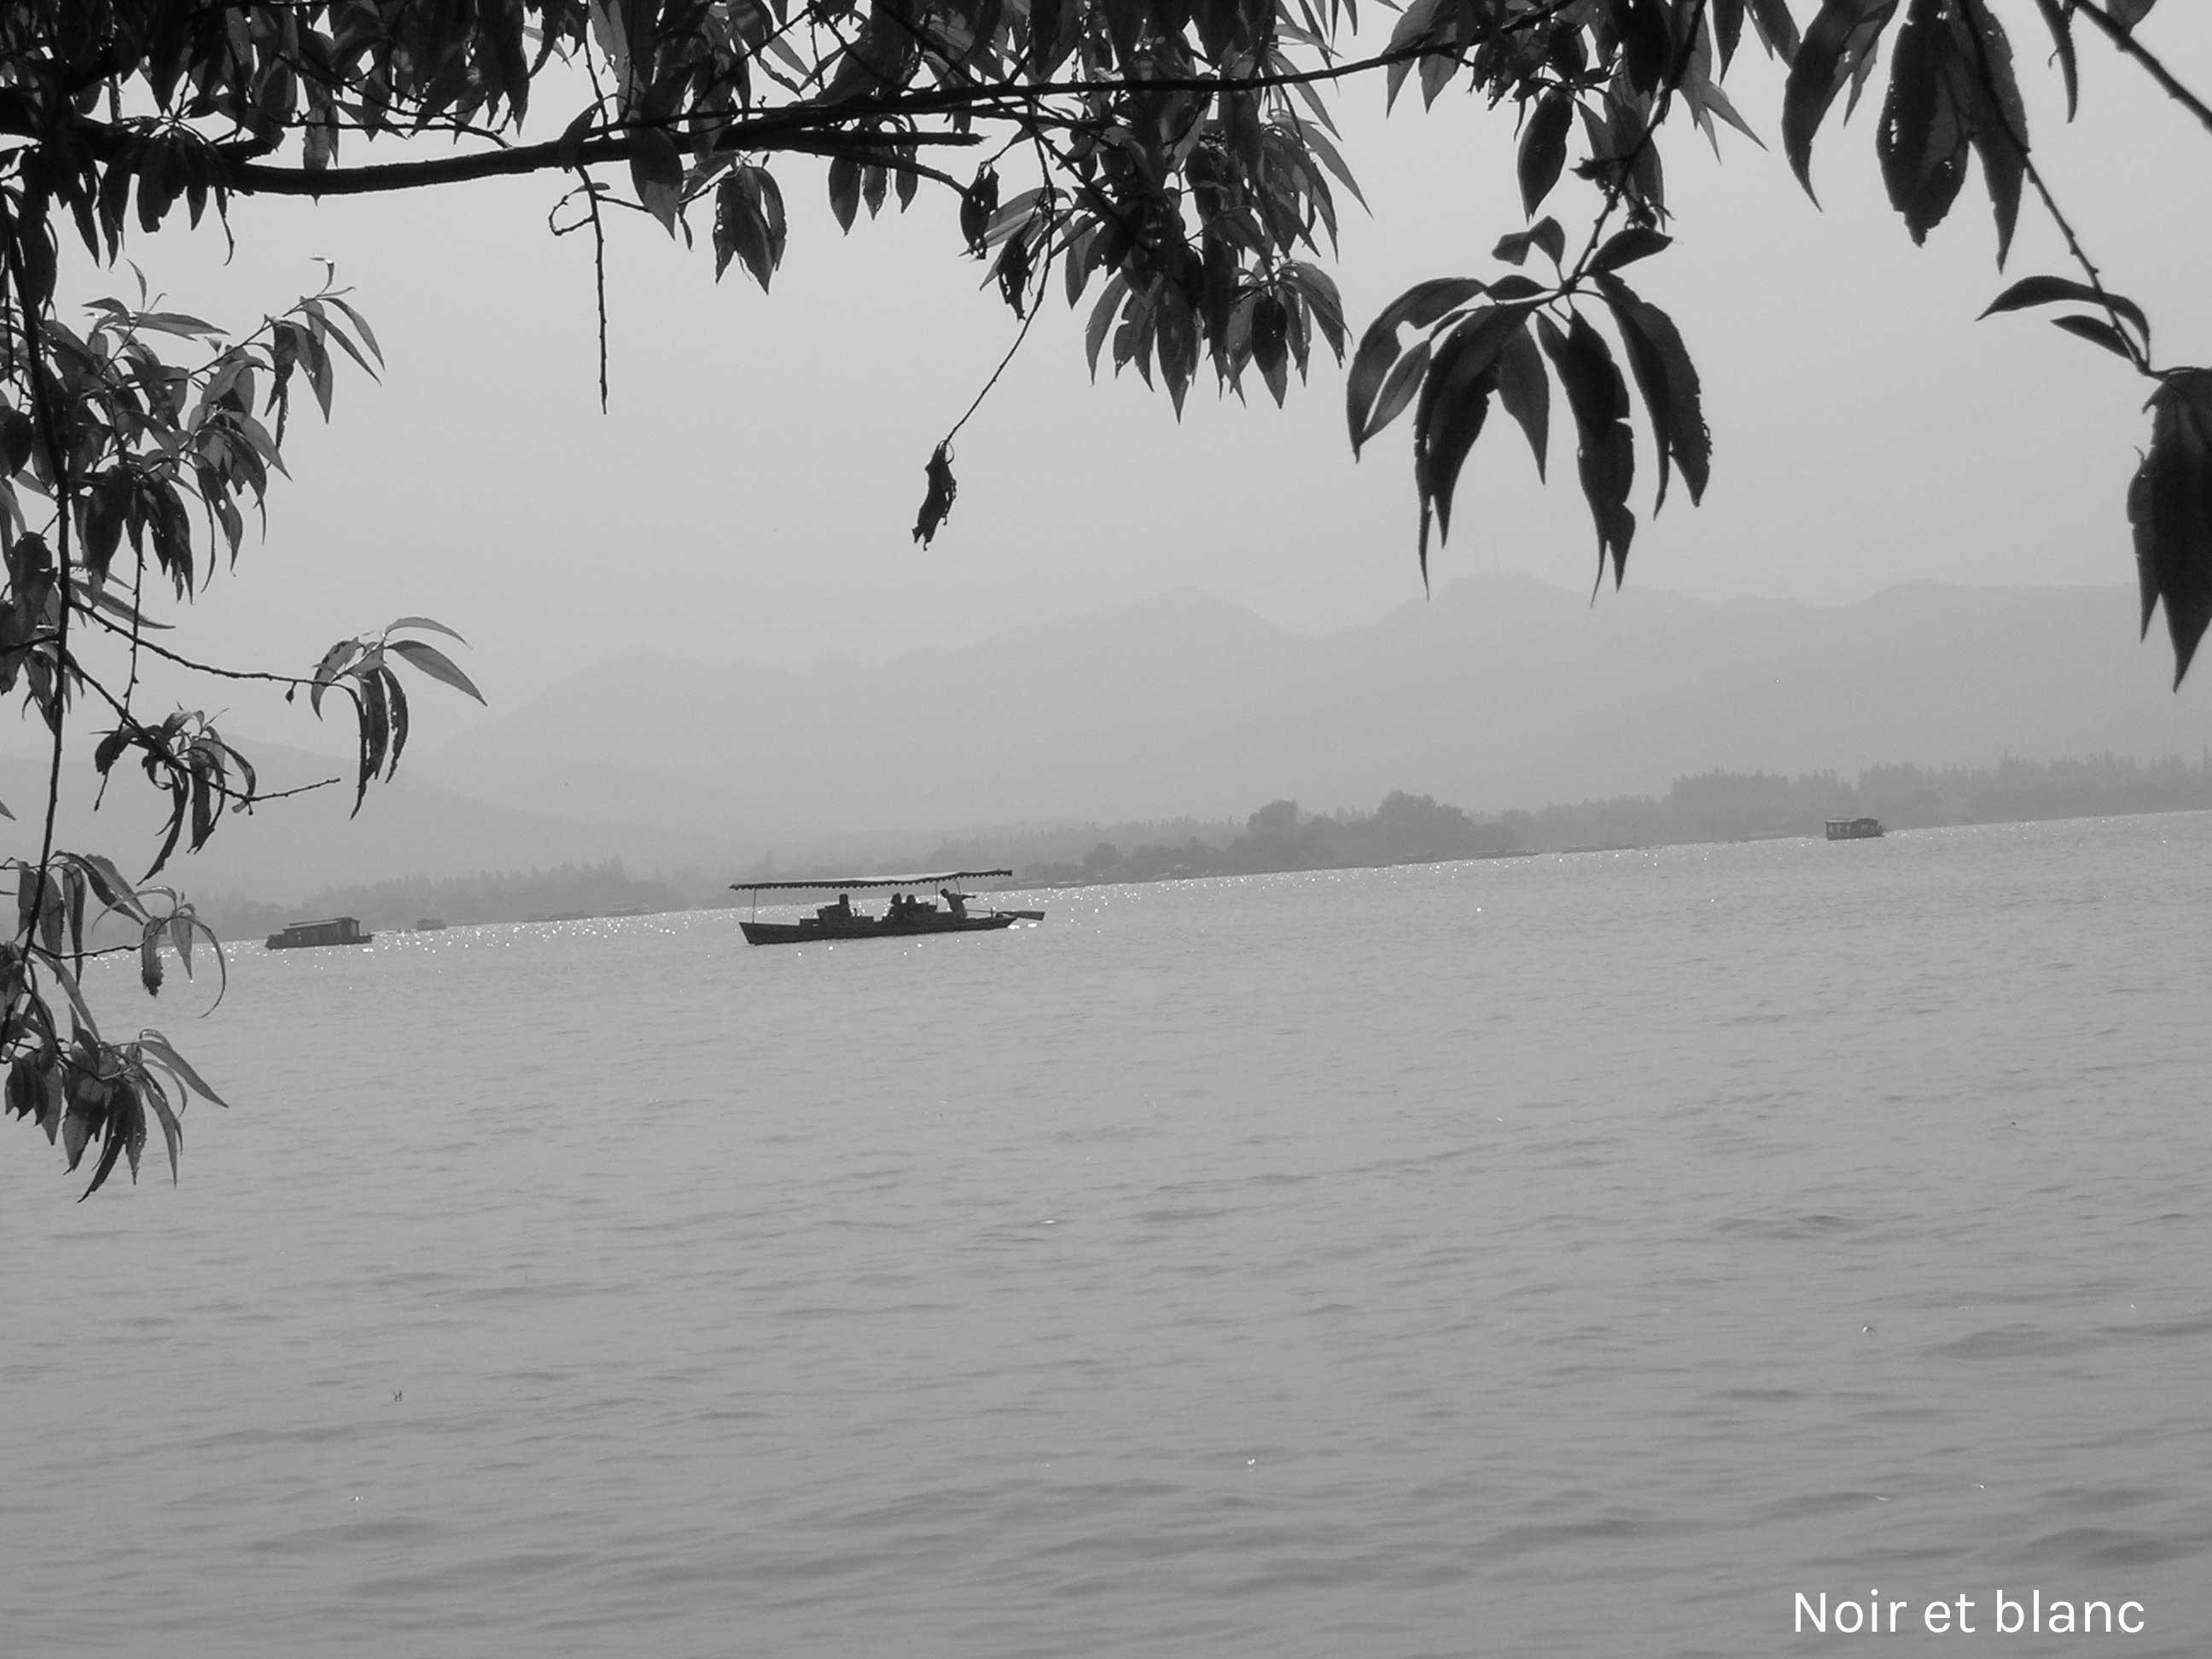 noir-et-blanc-hangzhou